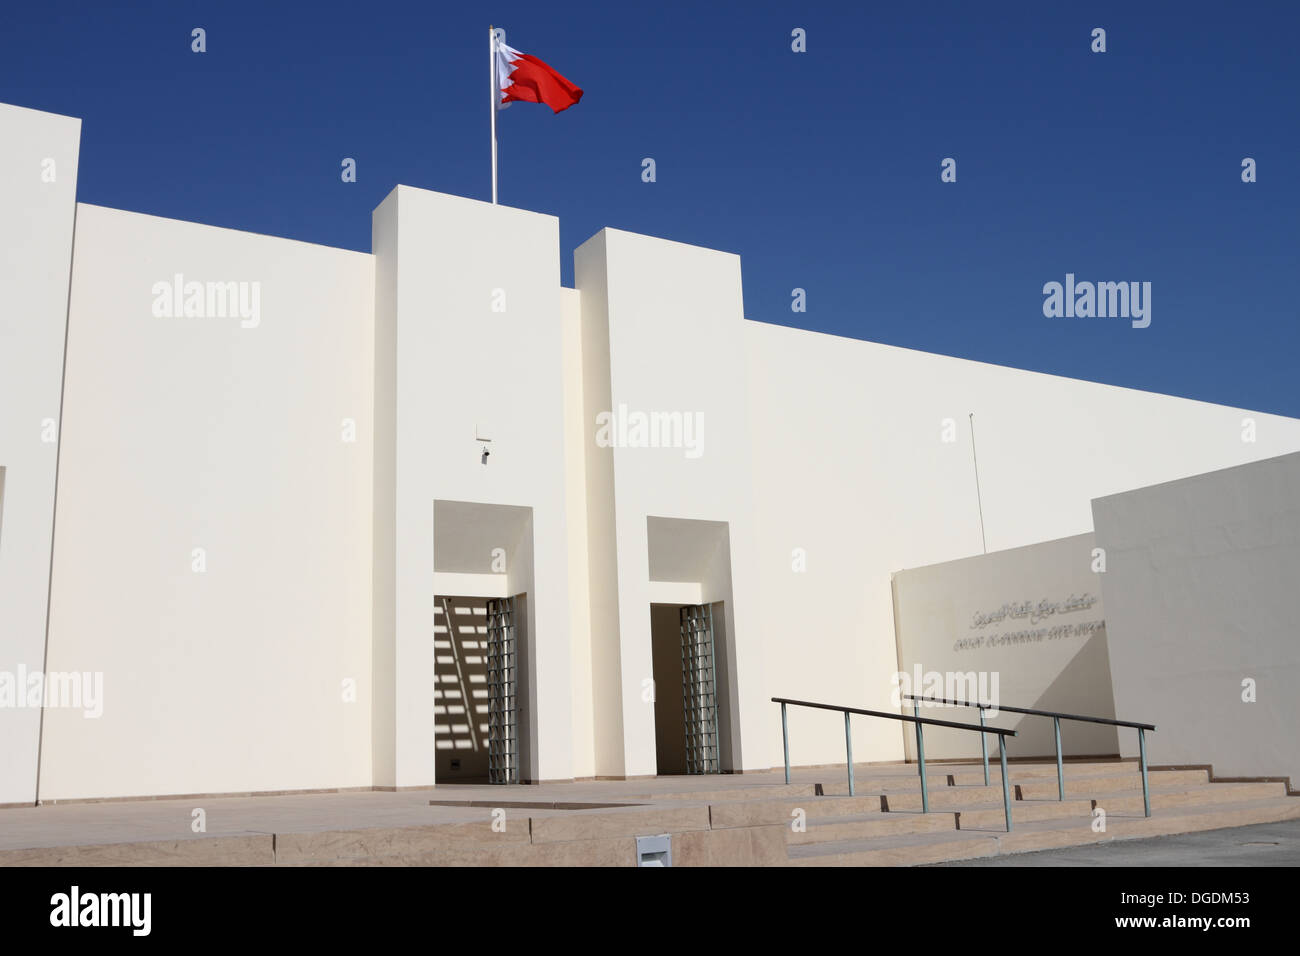 External view of the Bahrain Fort Museum, Al Qalah, Kingdom of Bahrain - Stock Image